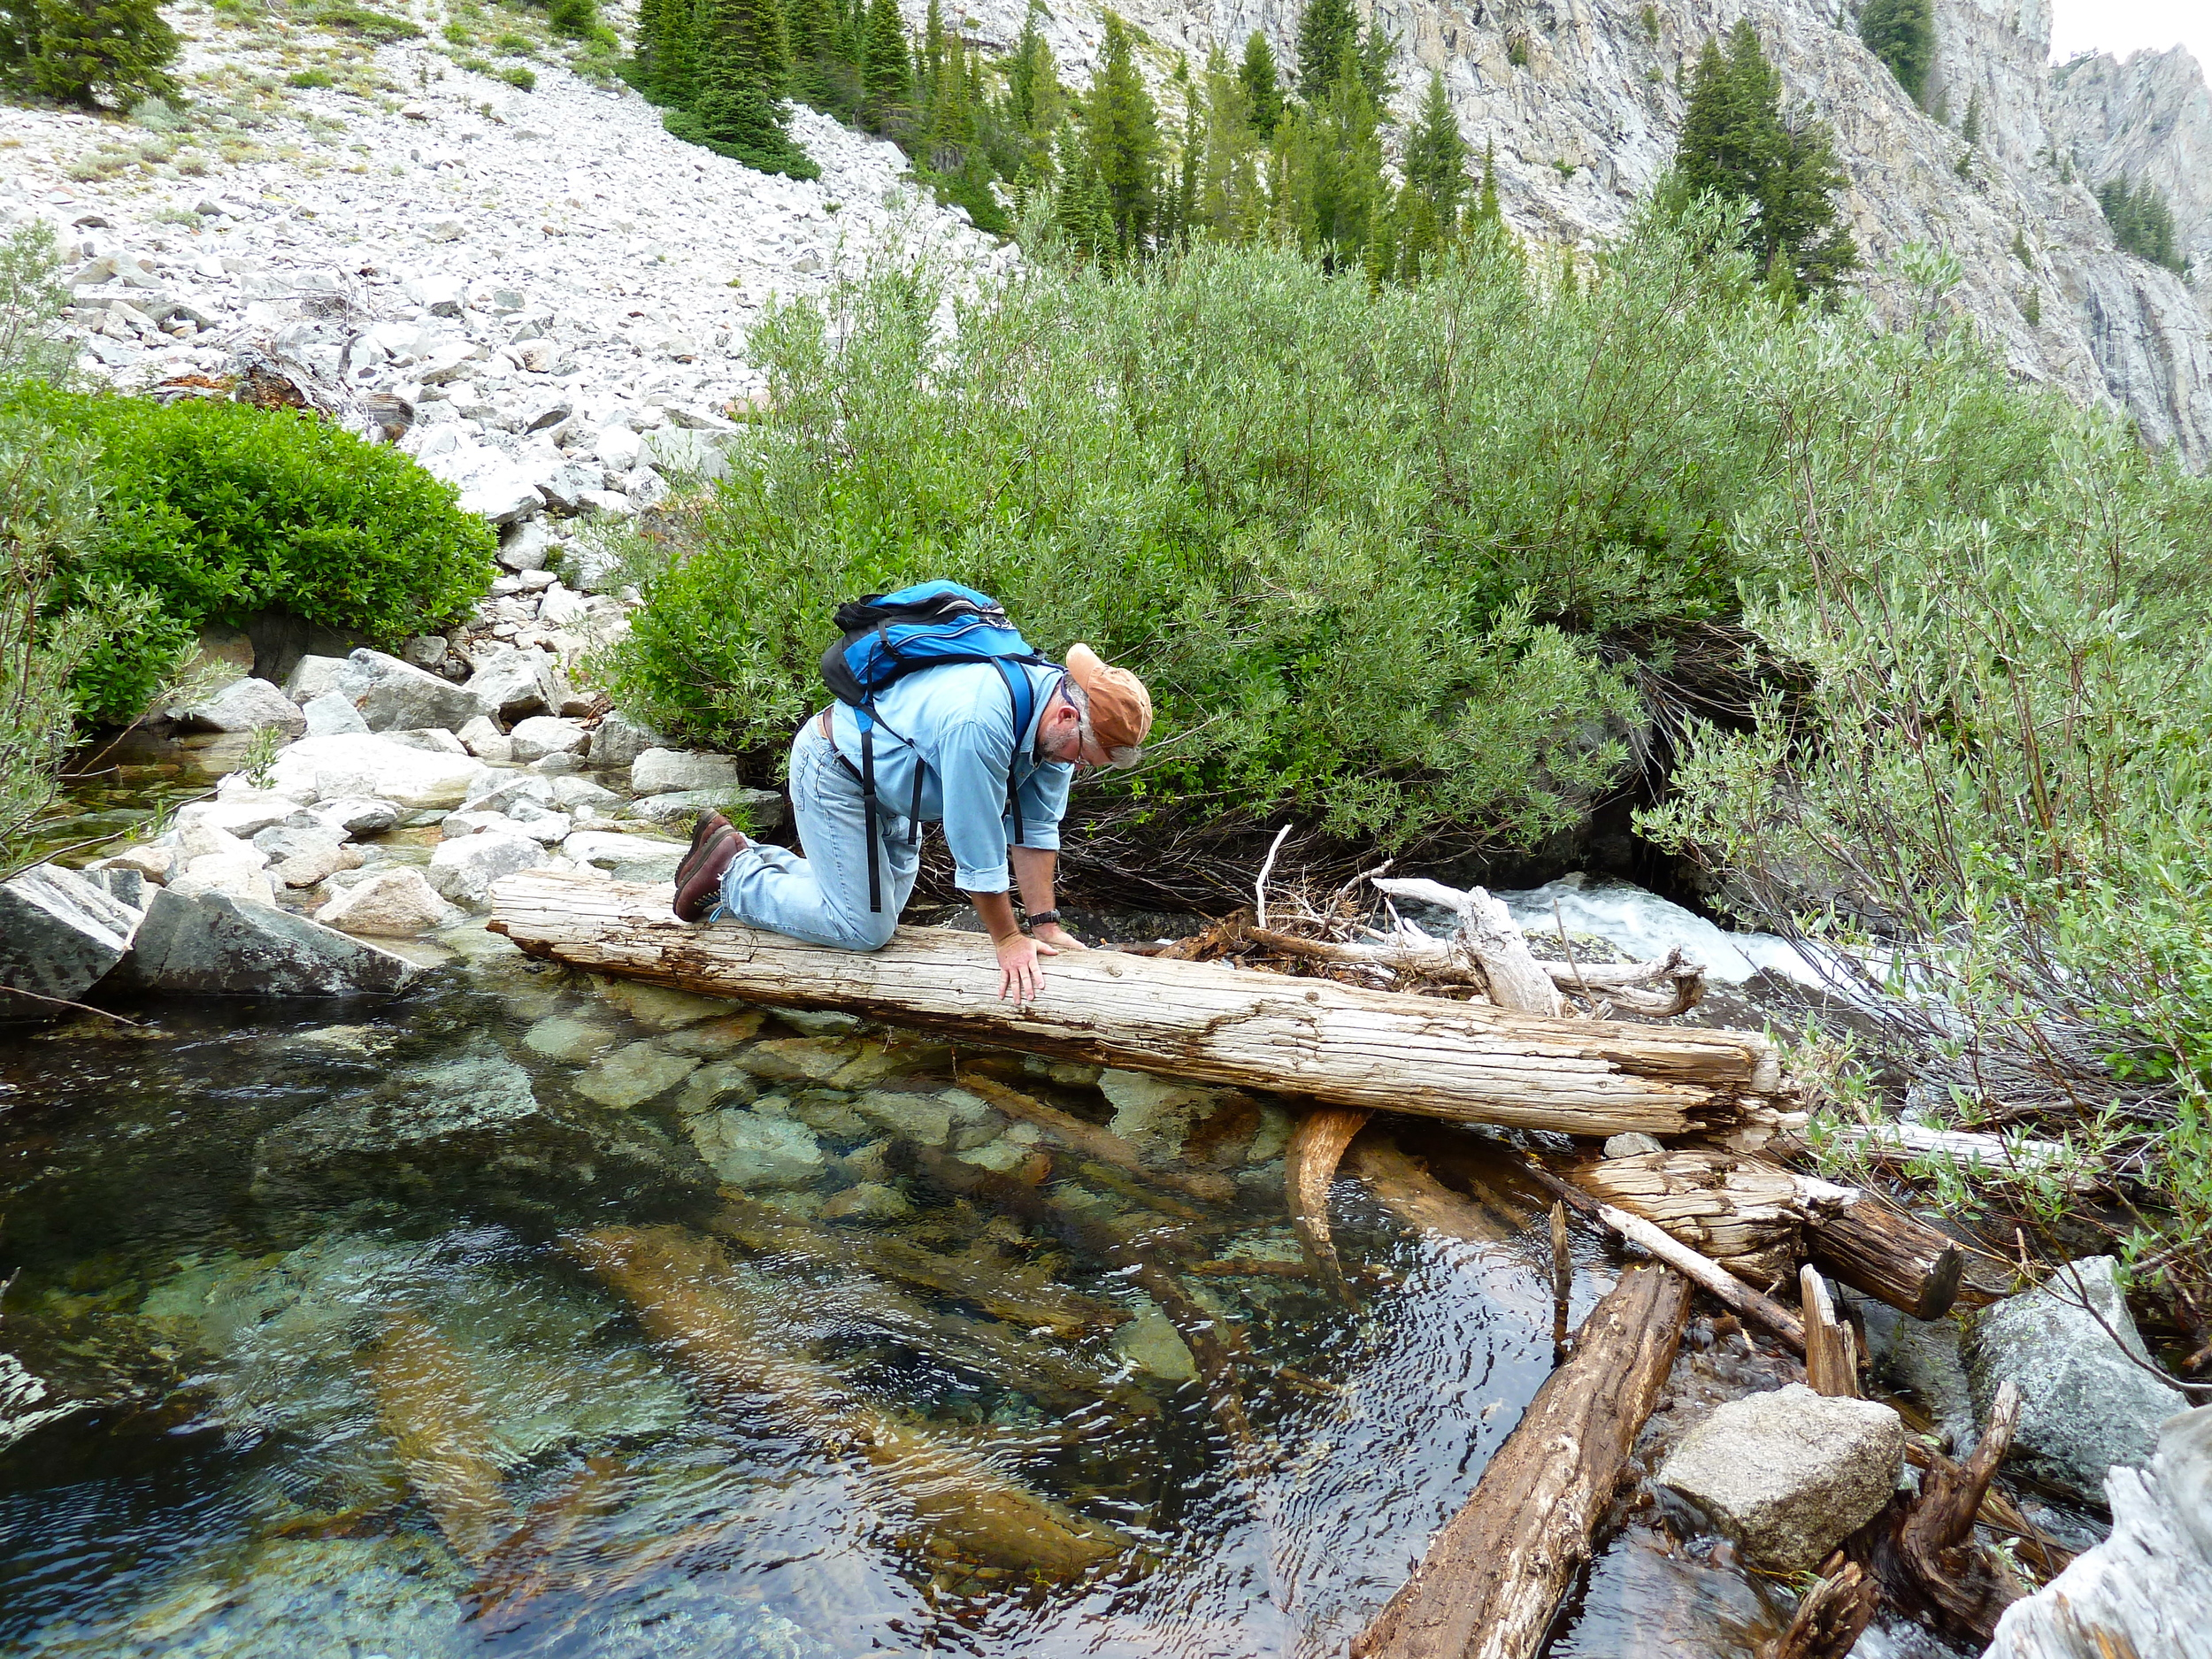 sawtooth wilderness stream crossing